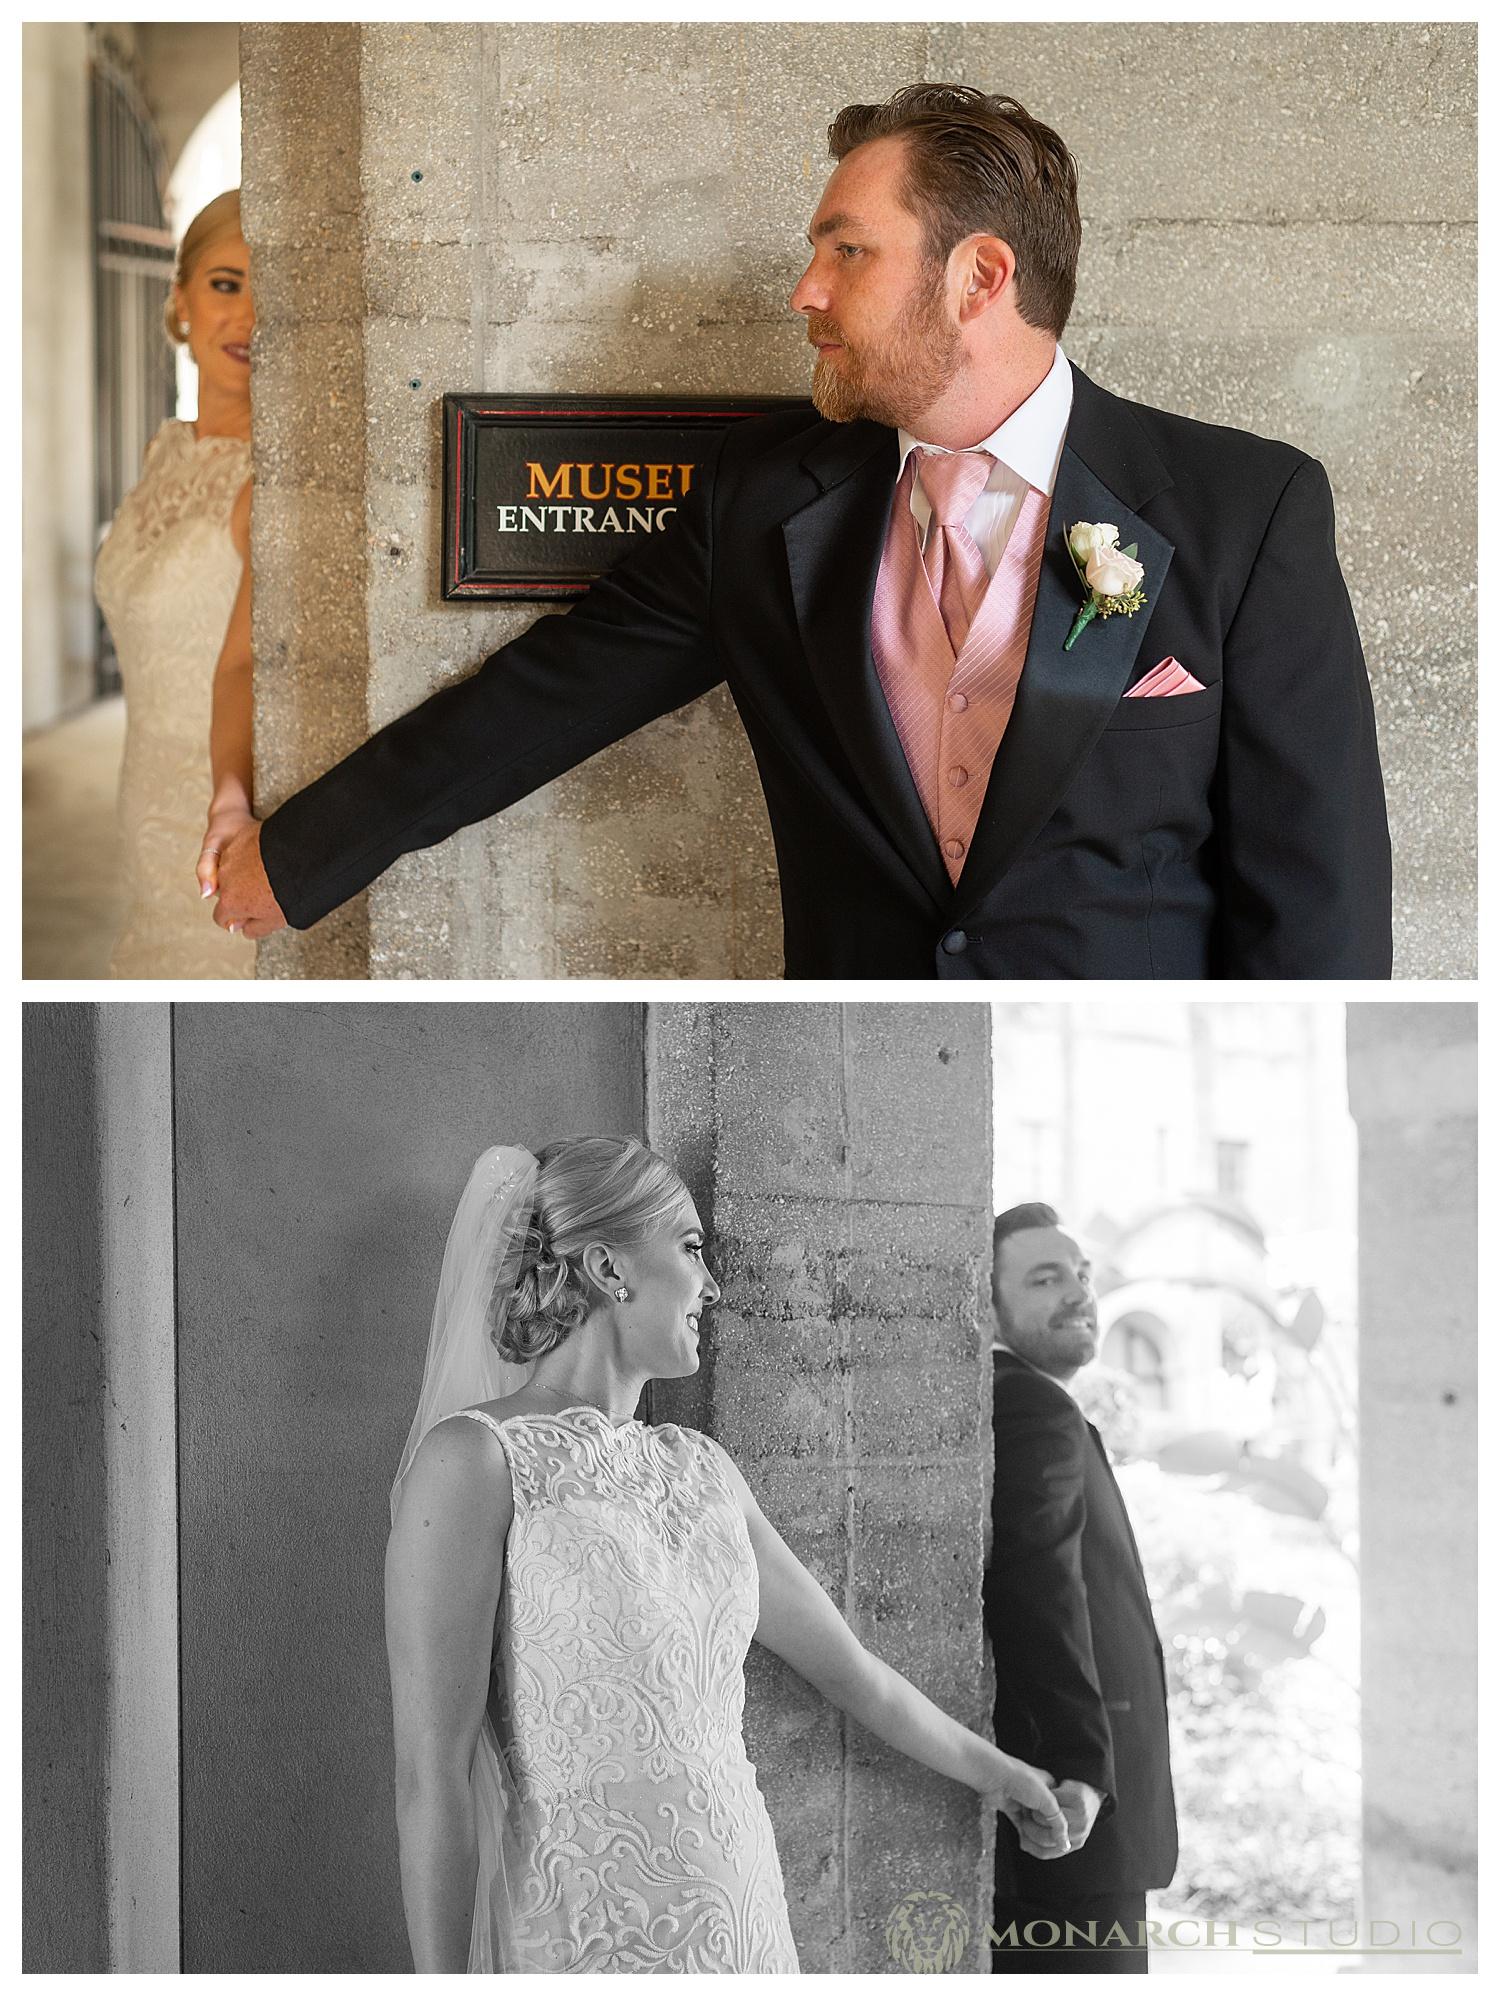 St. Augustine Wedding - Amore Wedding Chapel - 024.JPG